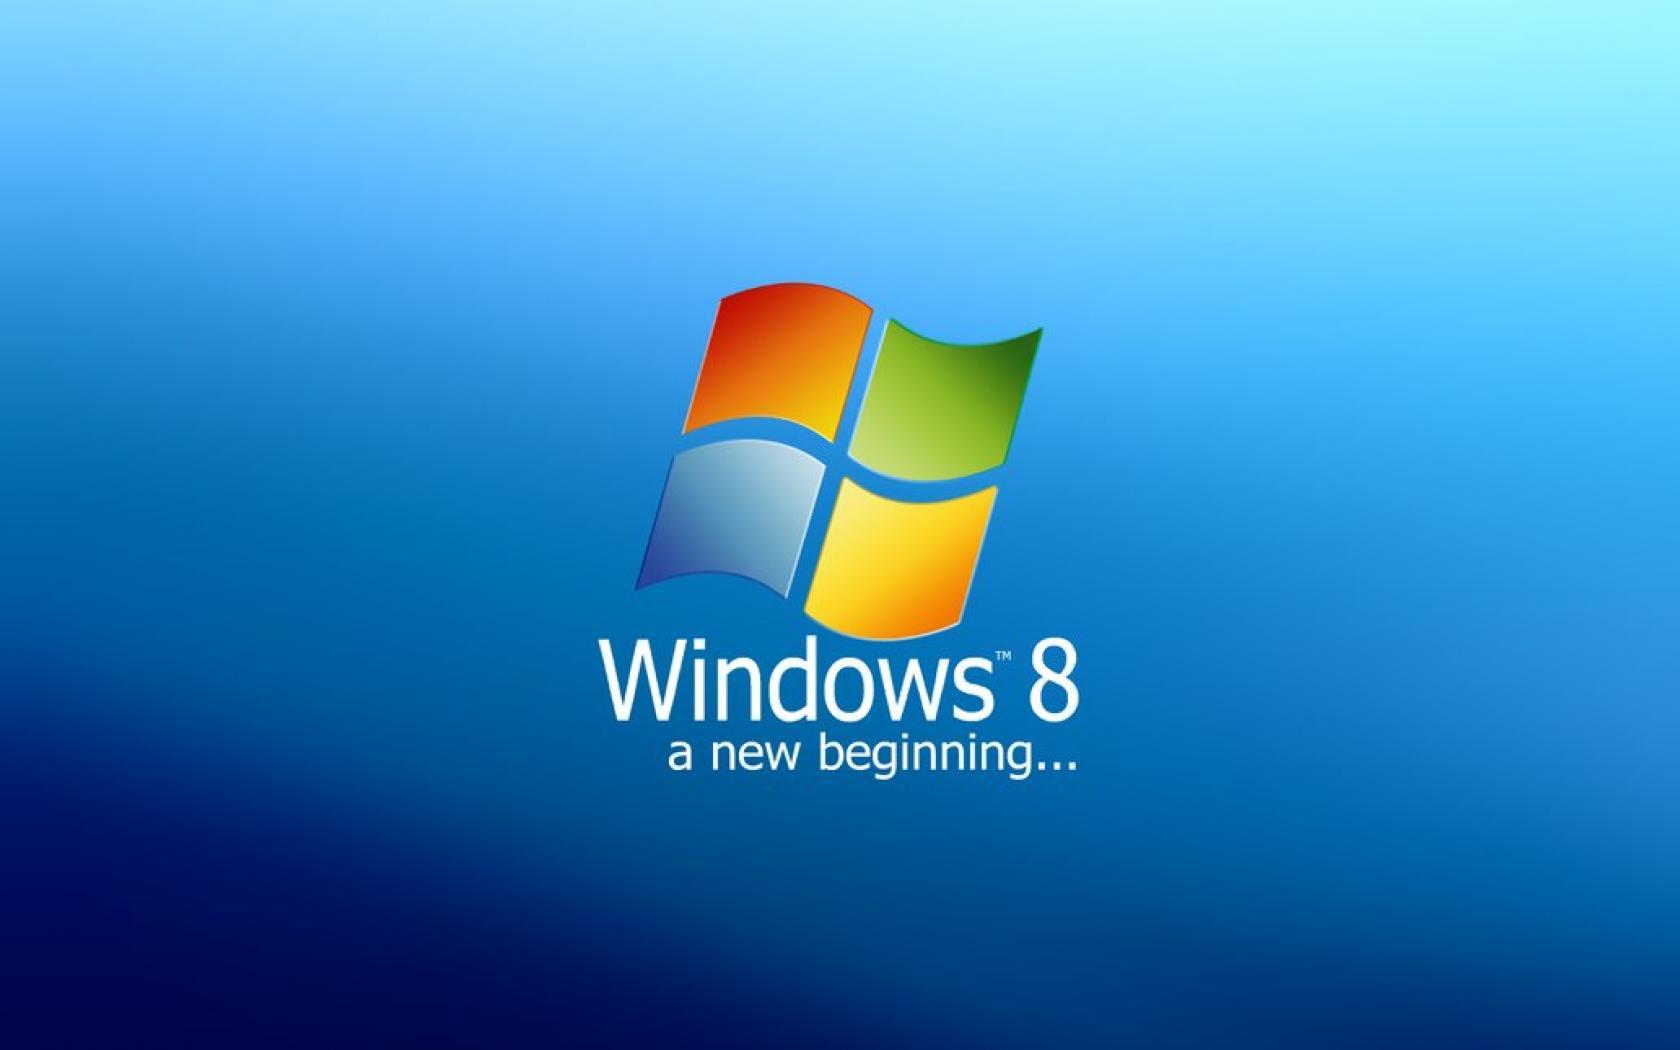 New Windows 8 Beginning Full HD Wallpaper Just another High Resolution 1680x1050